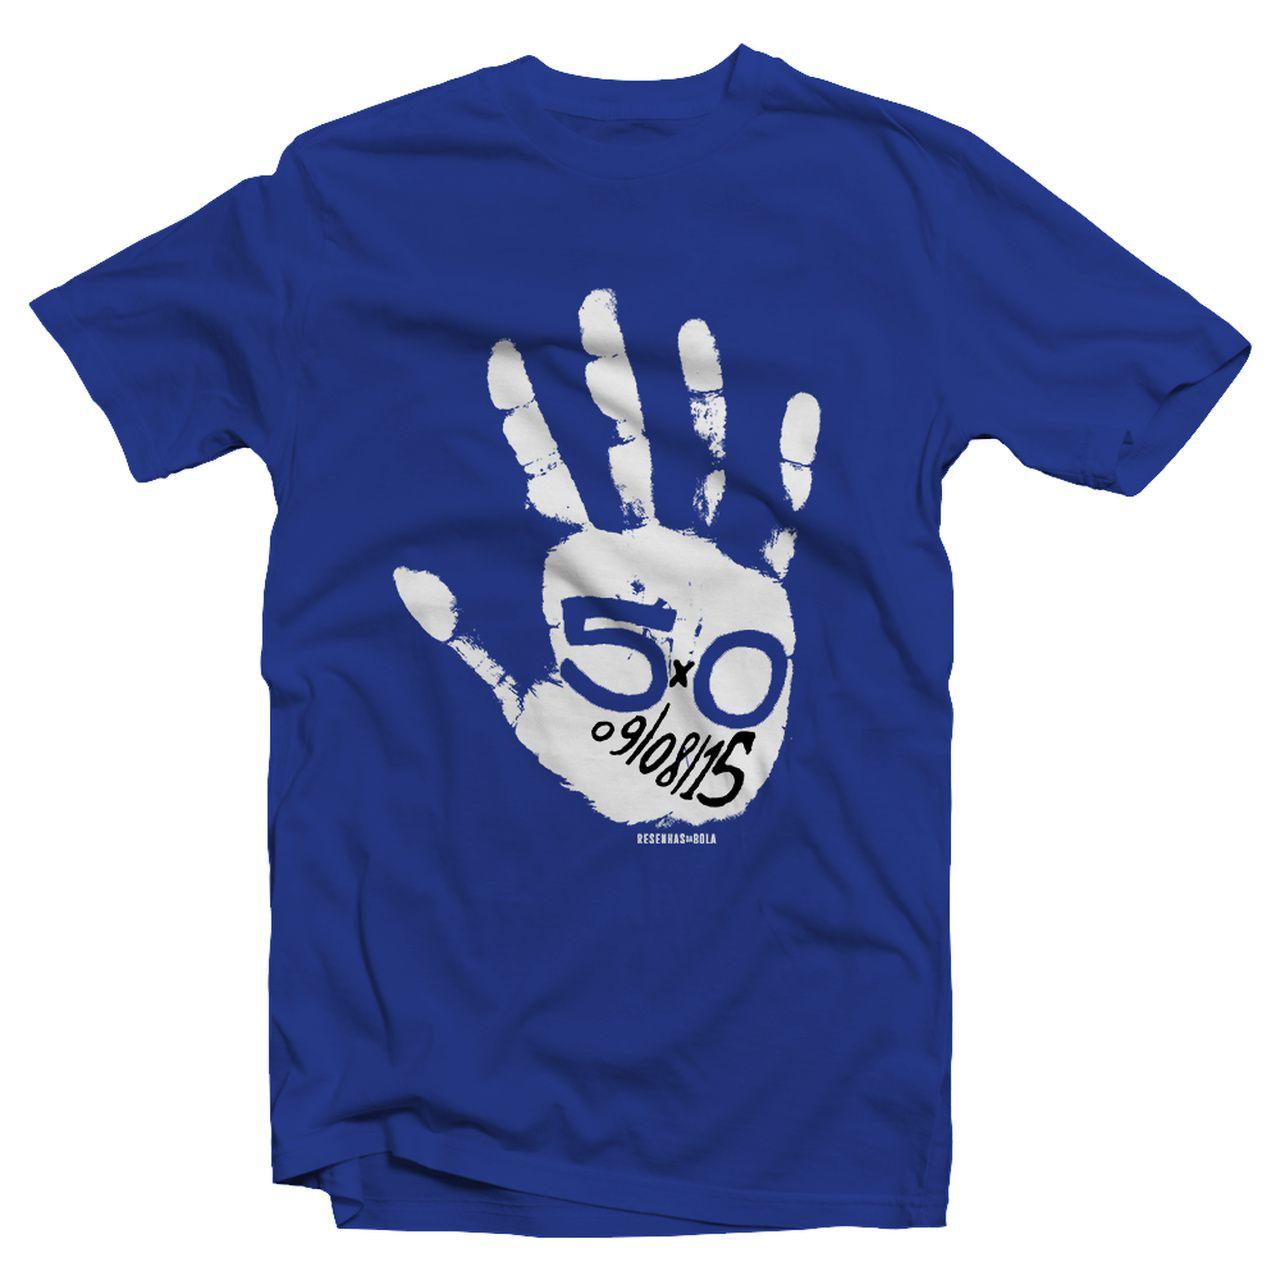 Camiseta - GRE: 5X0. Masculino